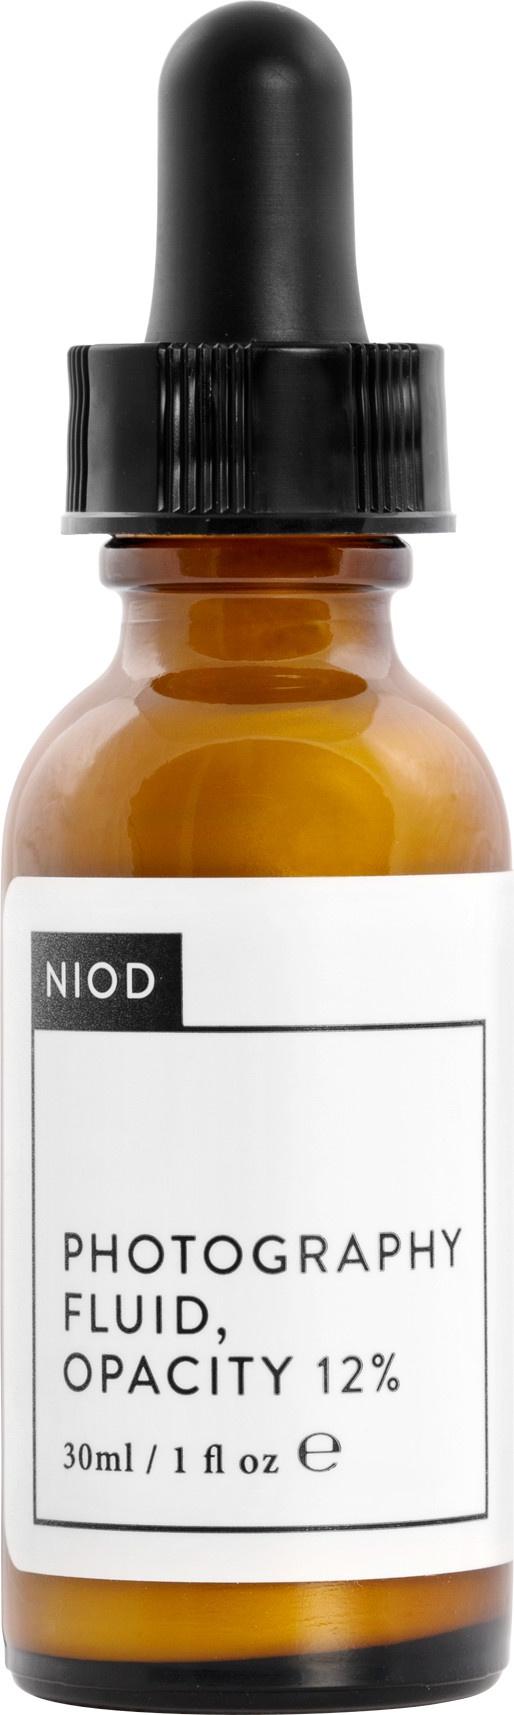 NIOD Photography Fluid, Colorless, Opacity 12%